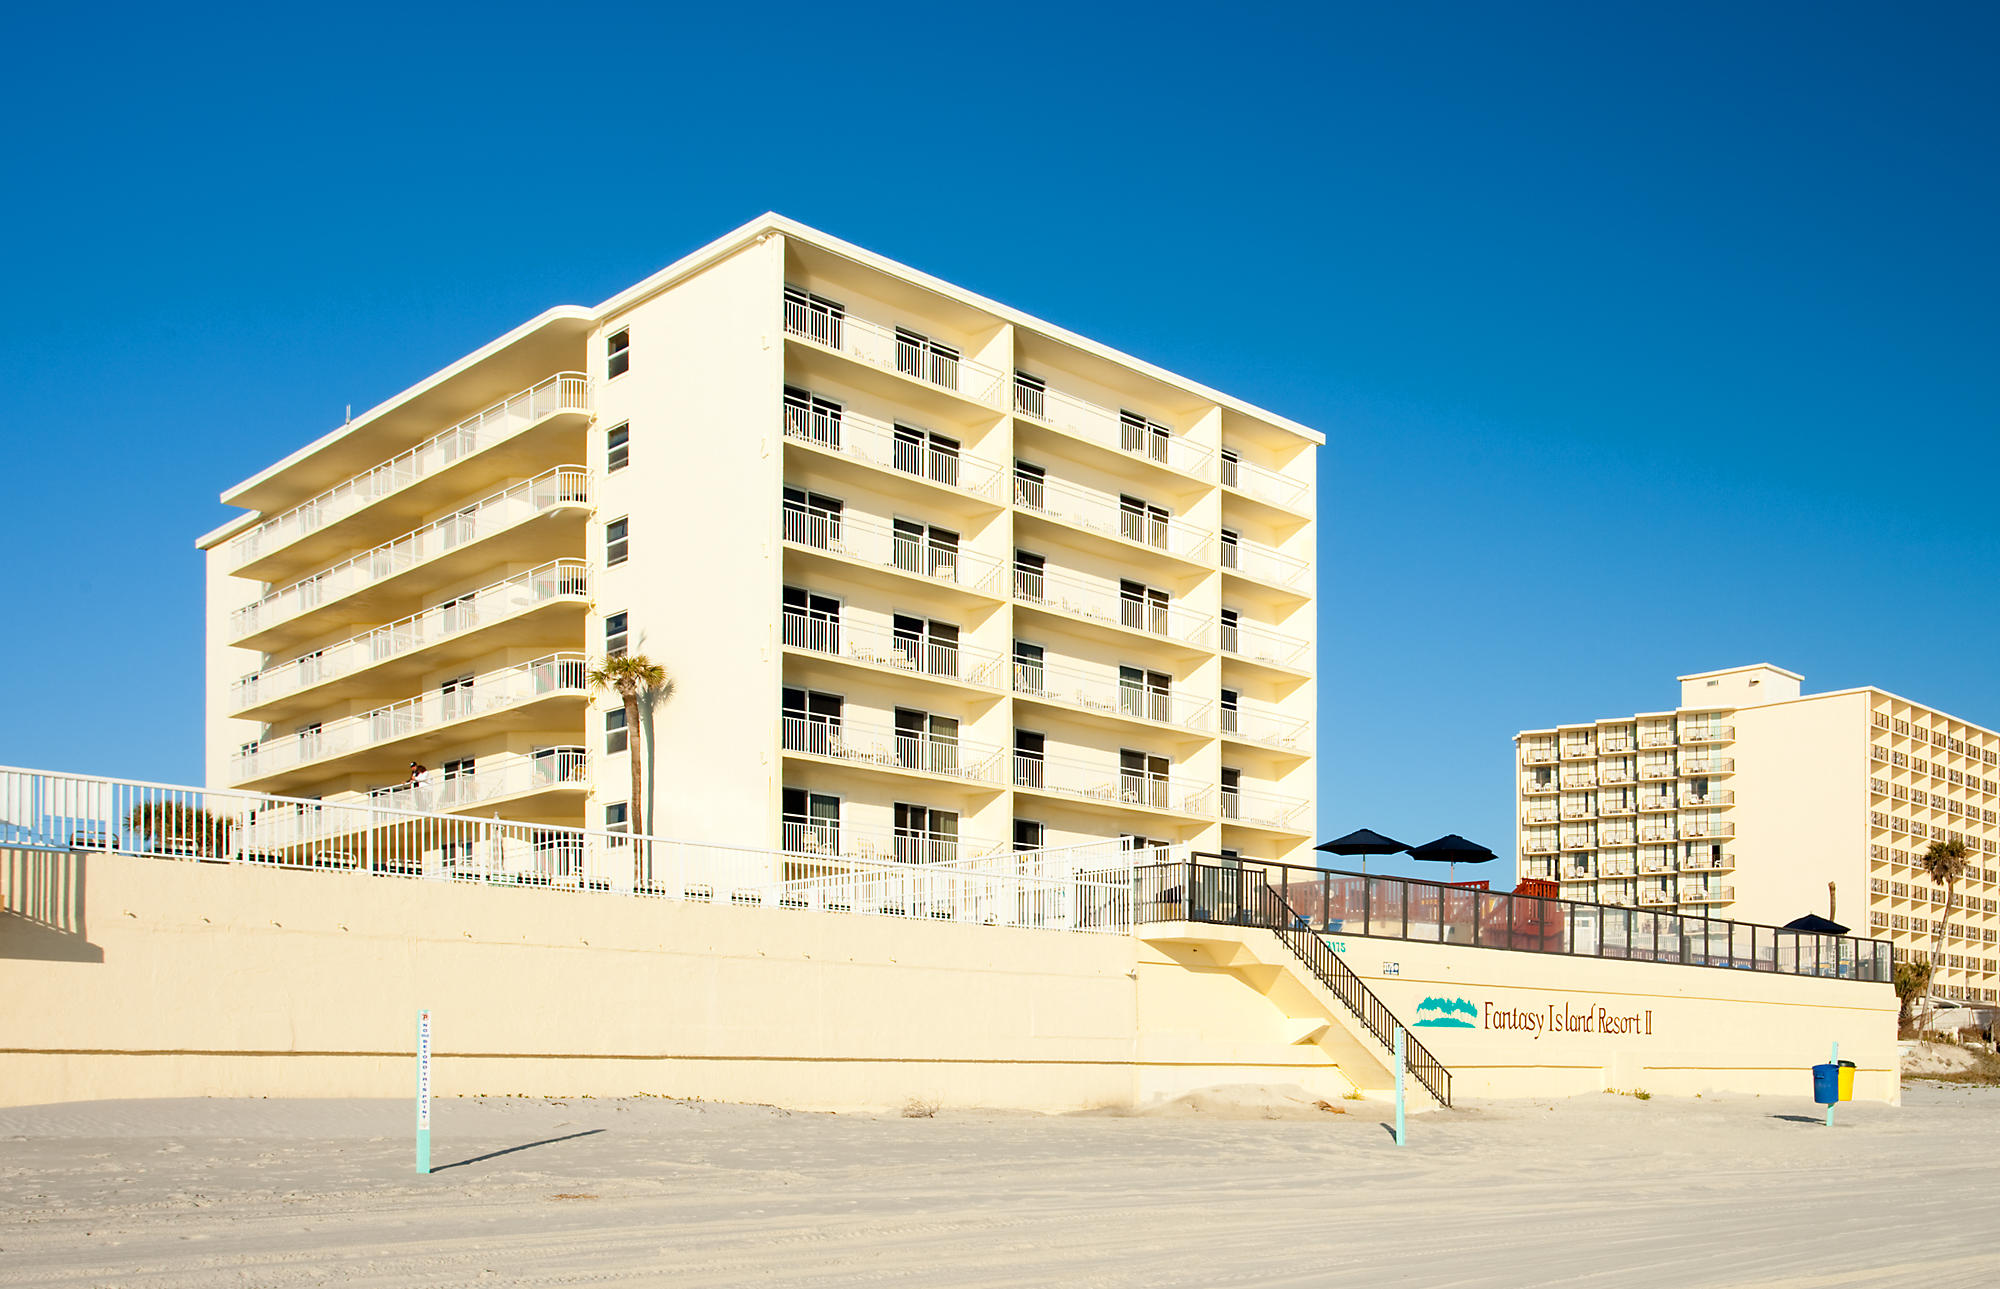 Fantasy Island Resort II Resort  Daytona Beach Florida